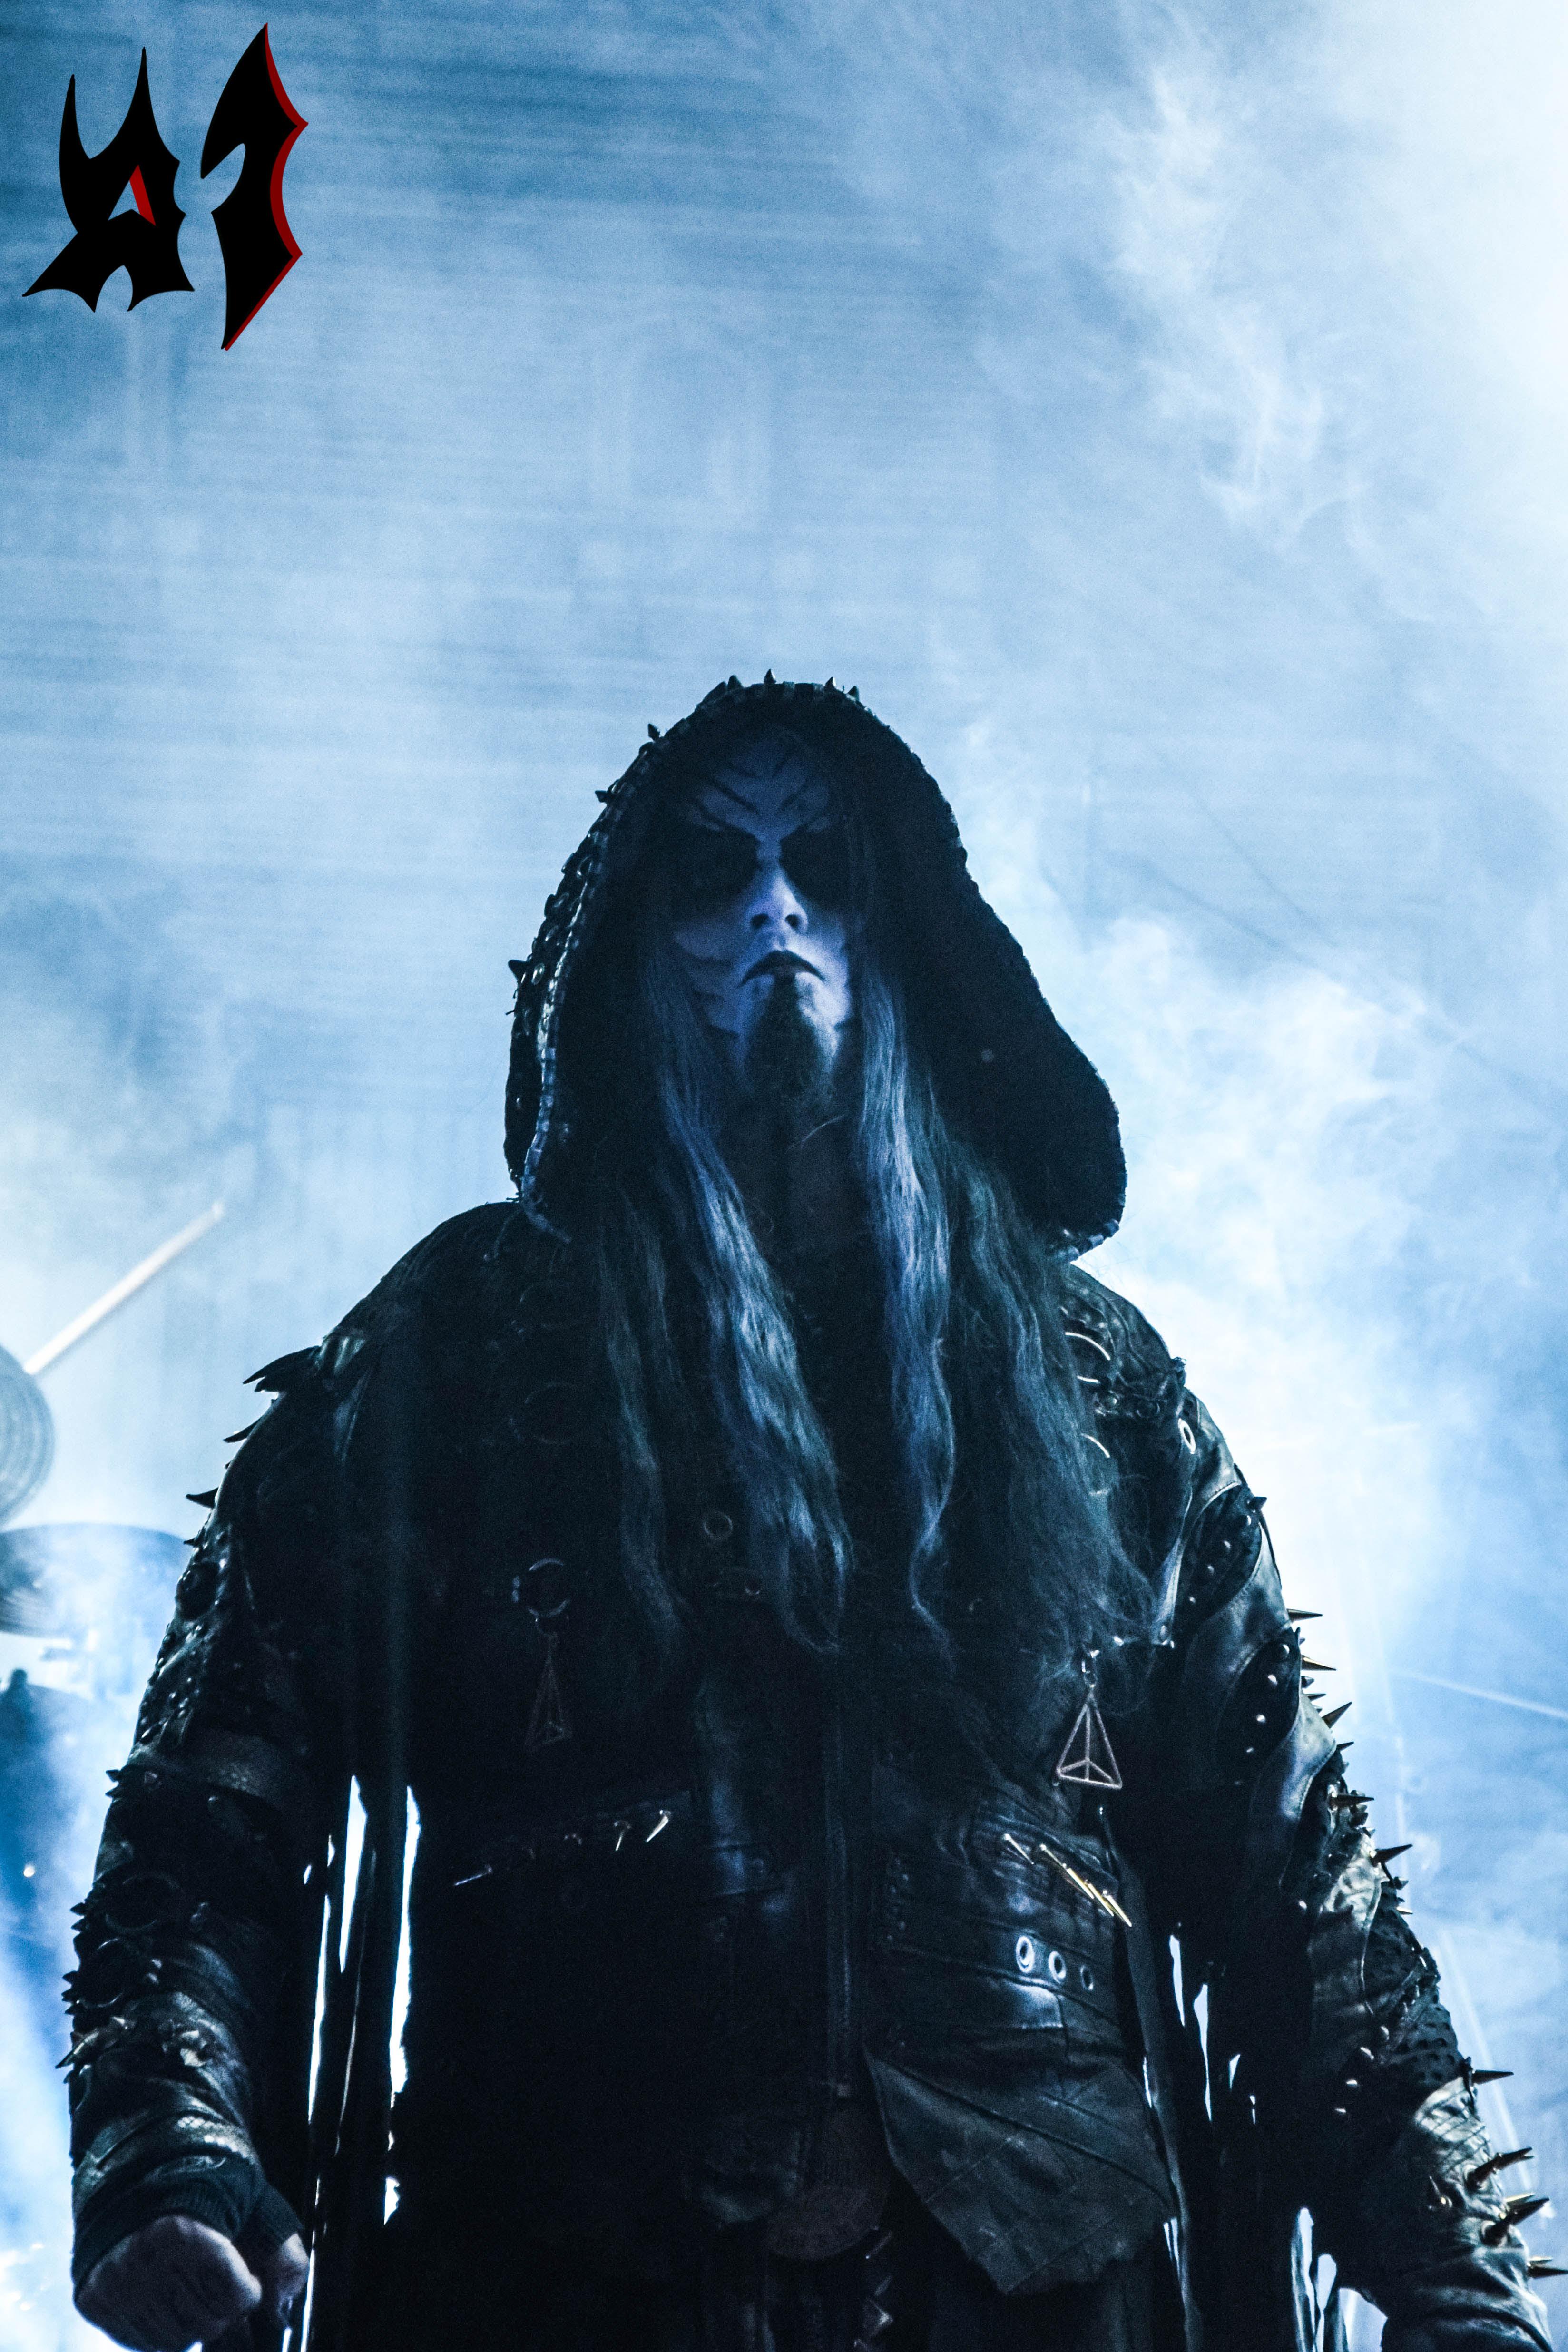 Hellfest - Jour 2 - Dimmu Borgir 4